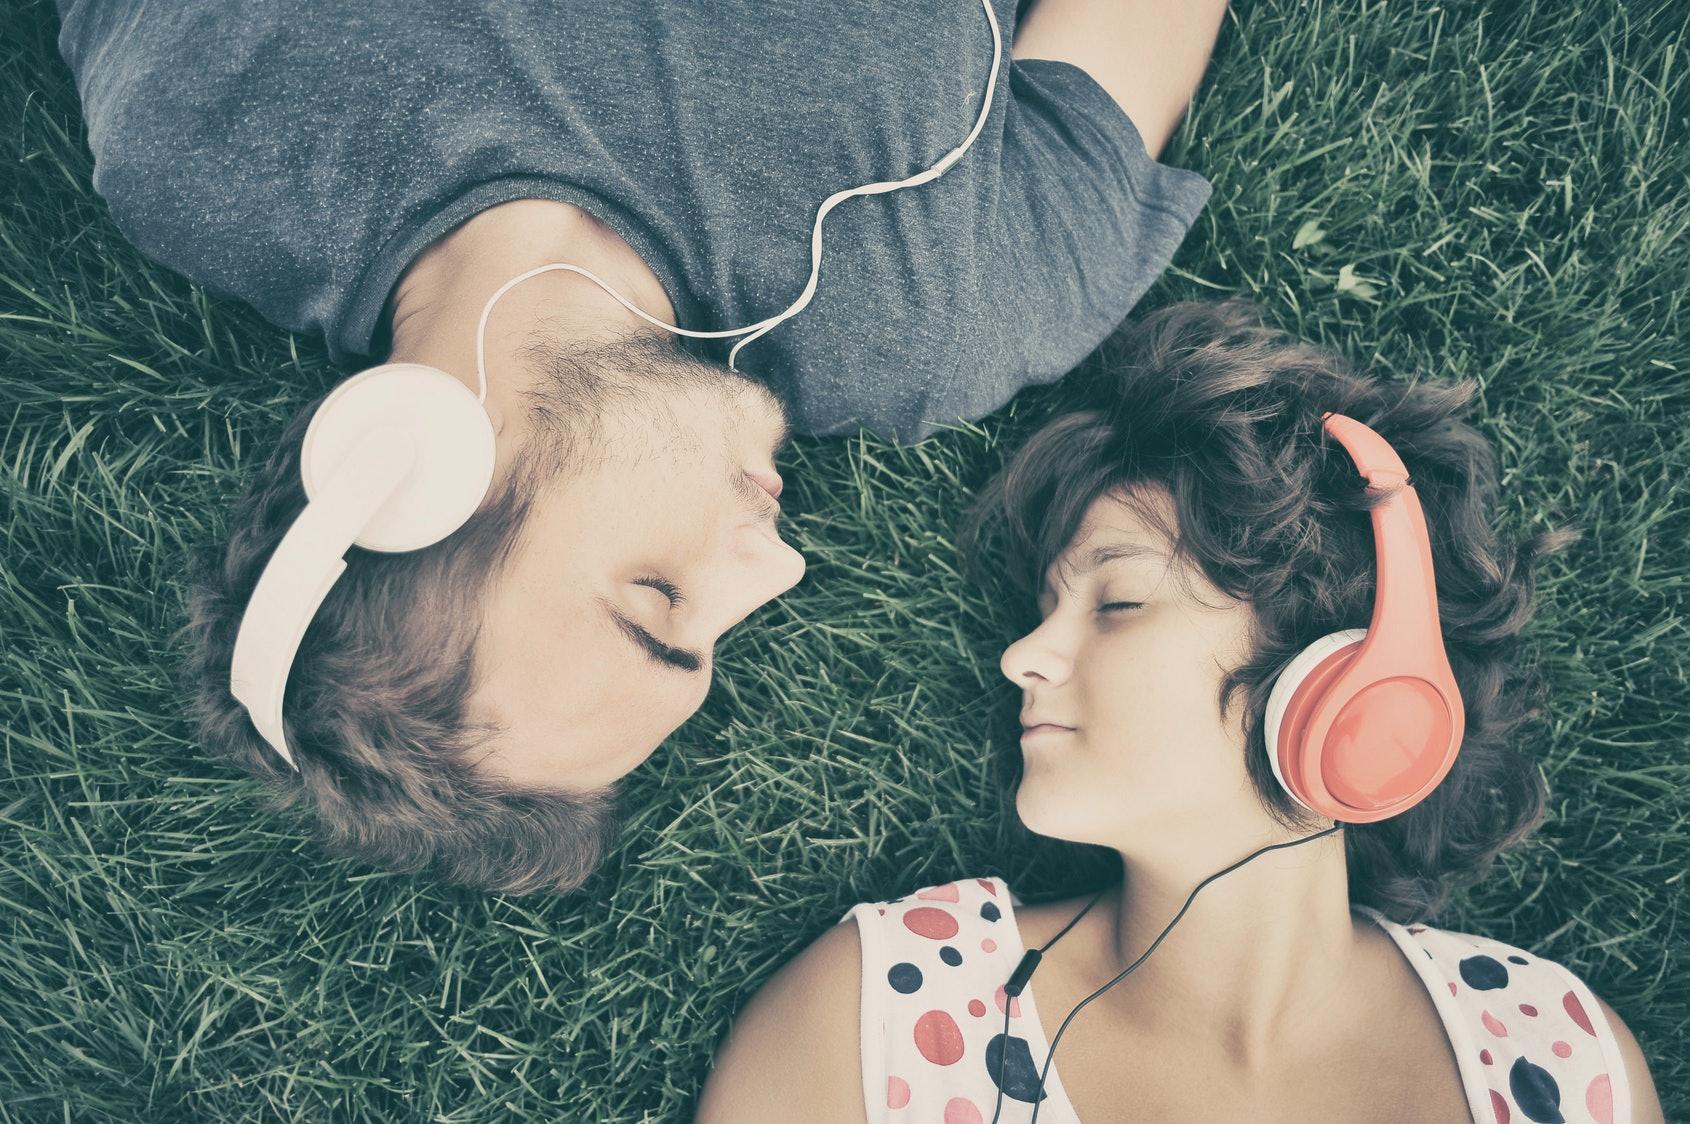 Dating playlist